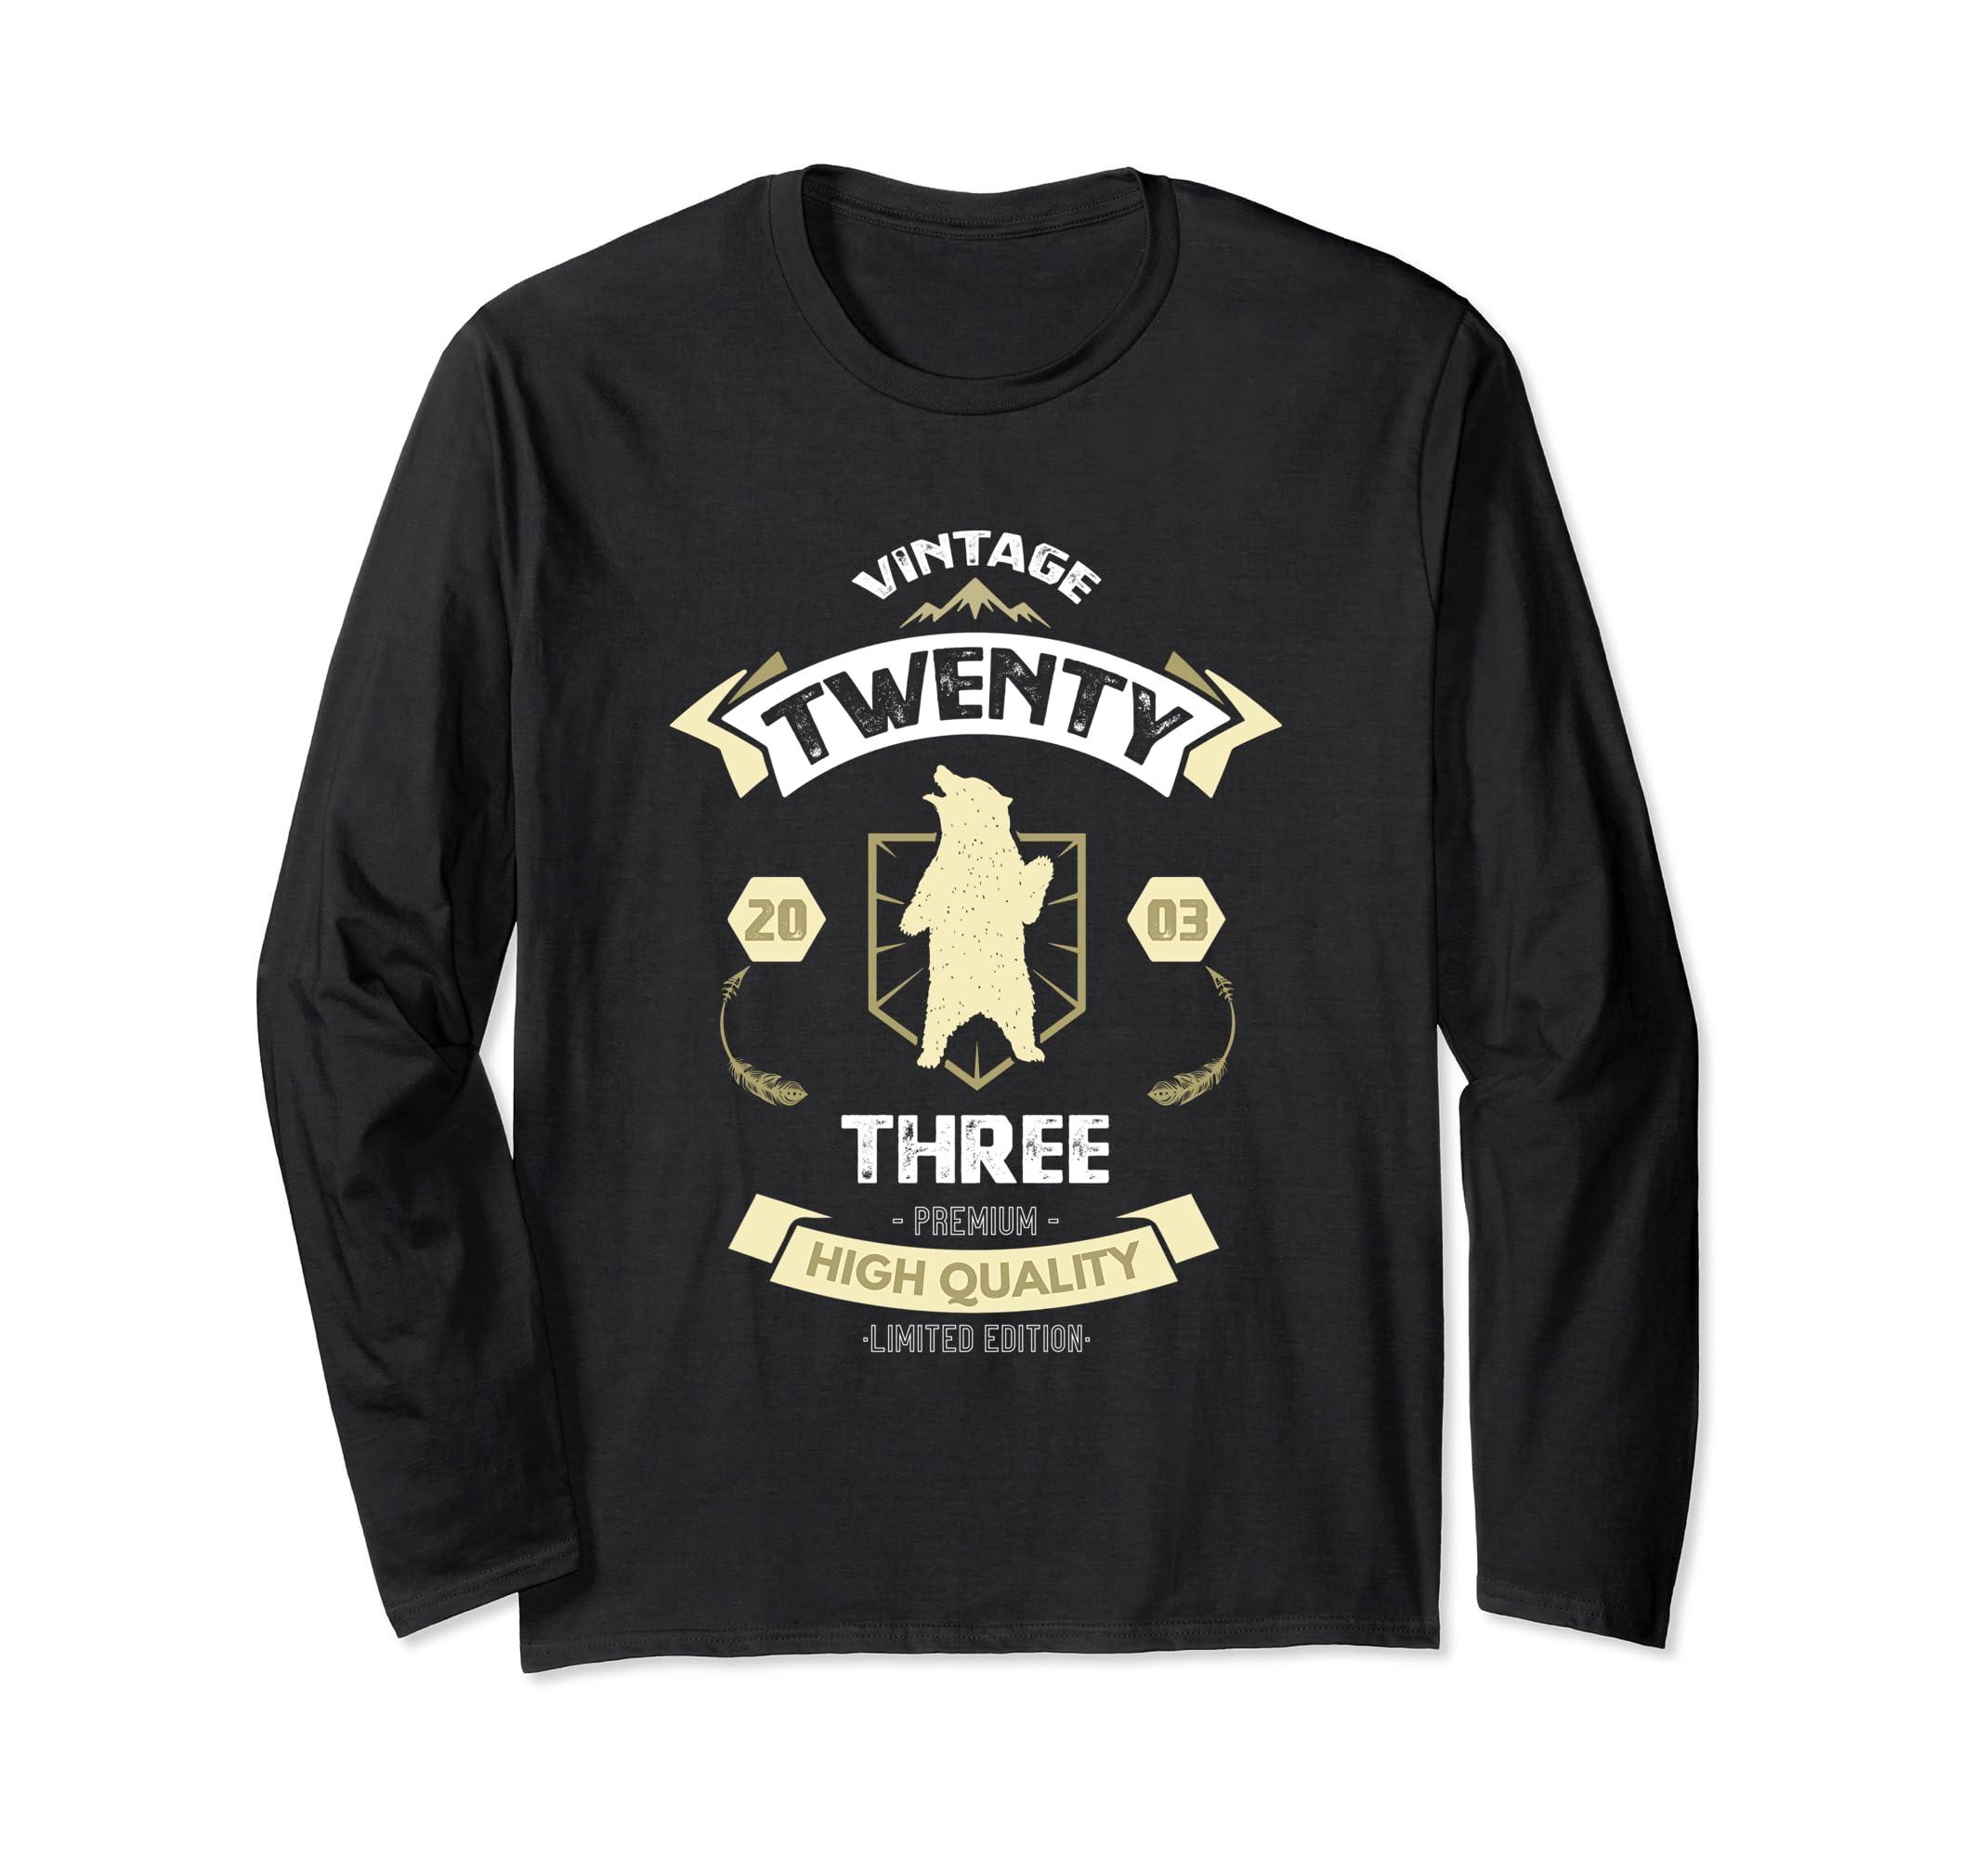 2003 15 Years Old 15th Birthday Cool Bear Gift Shirt-Bawle